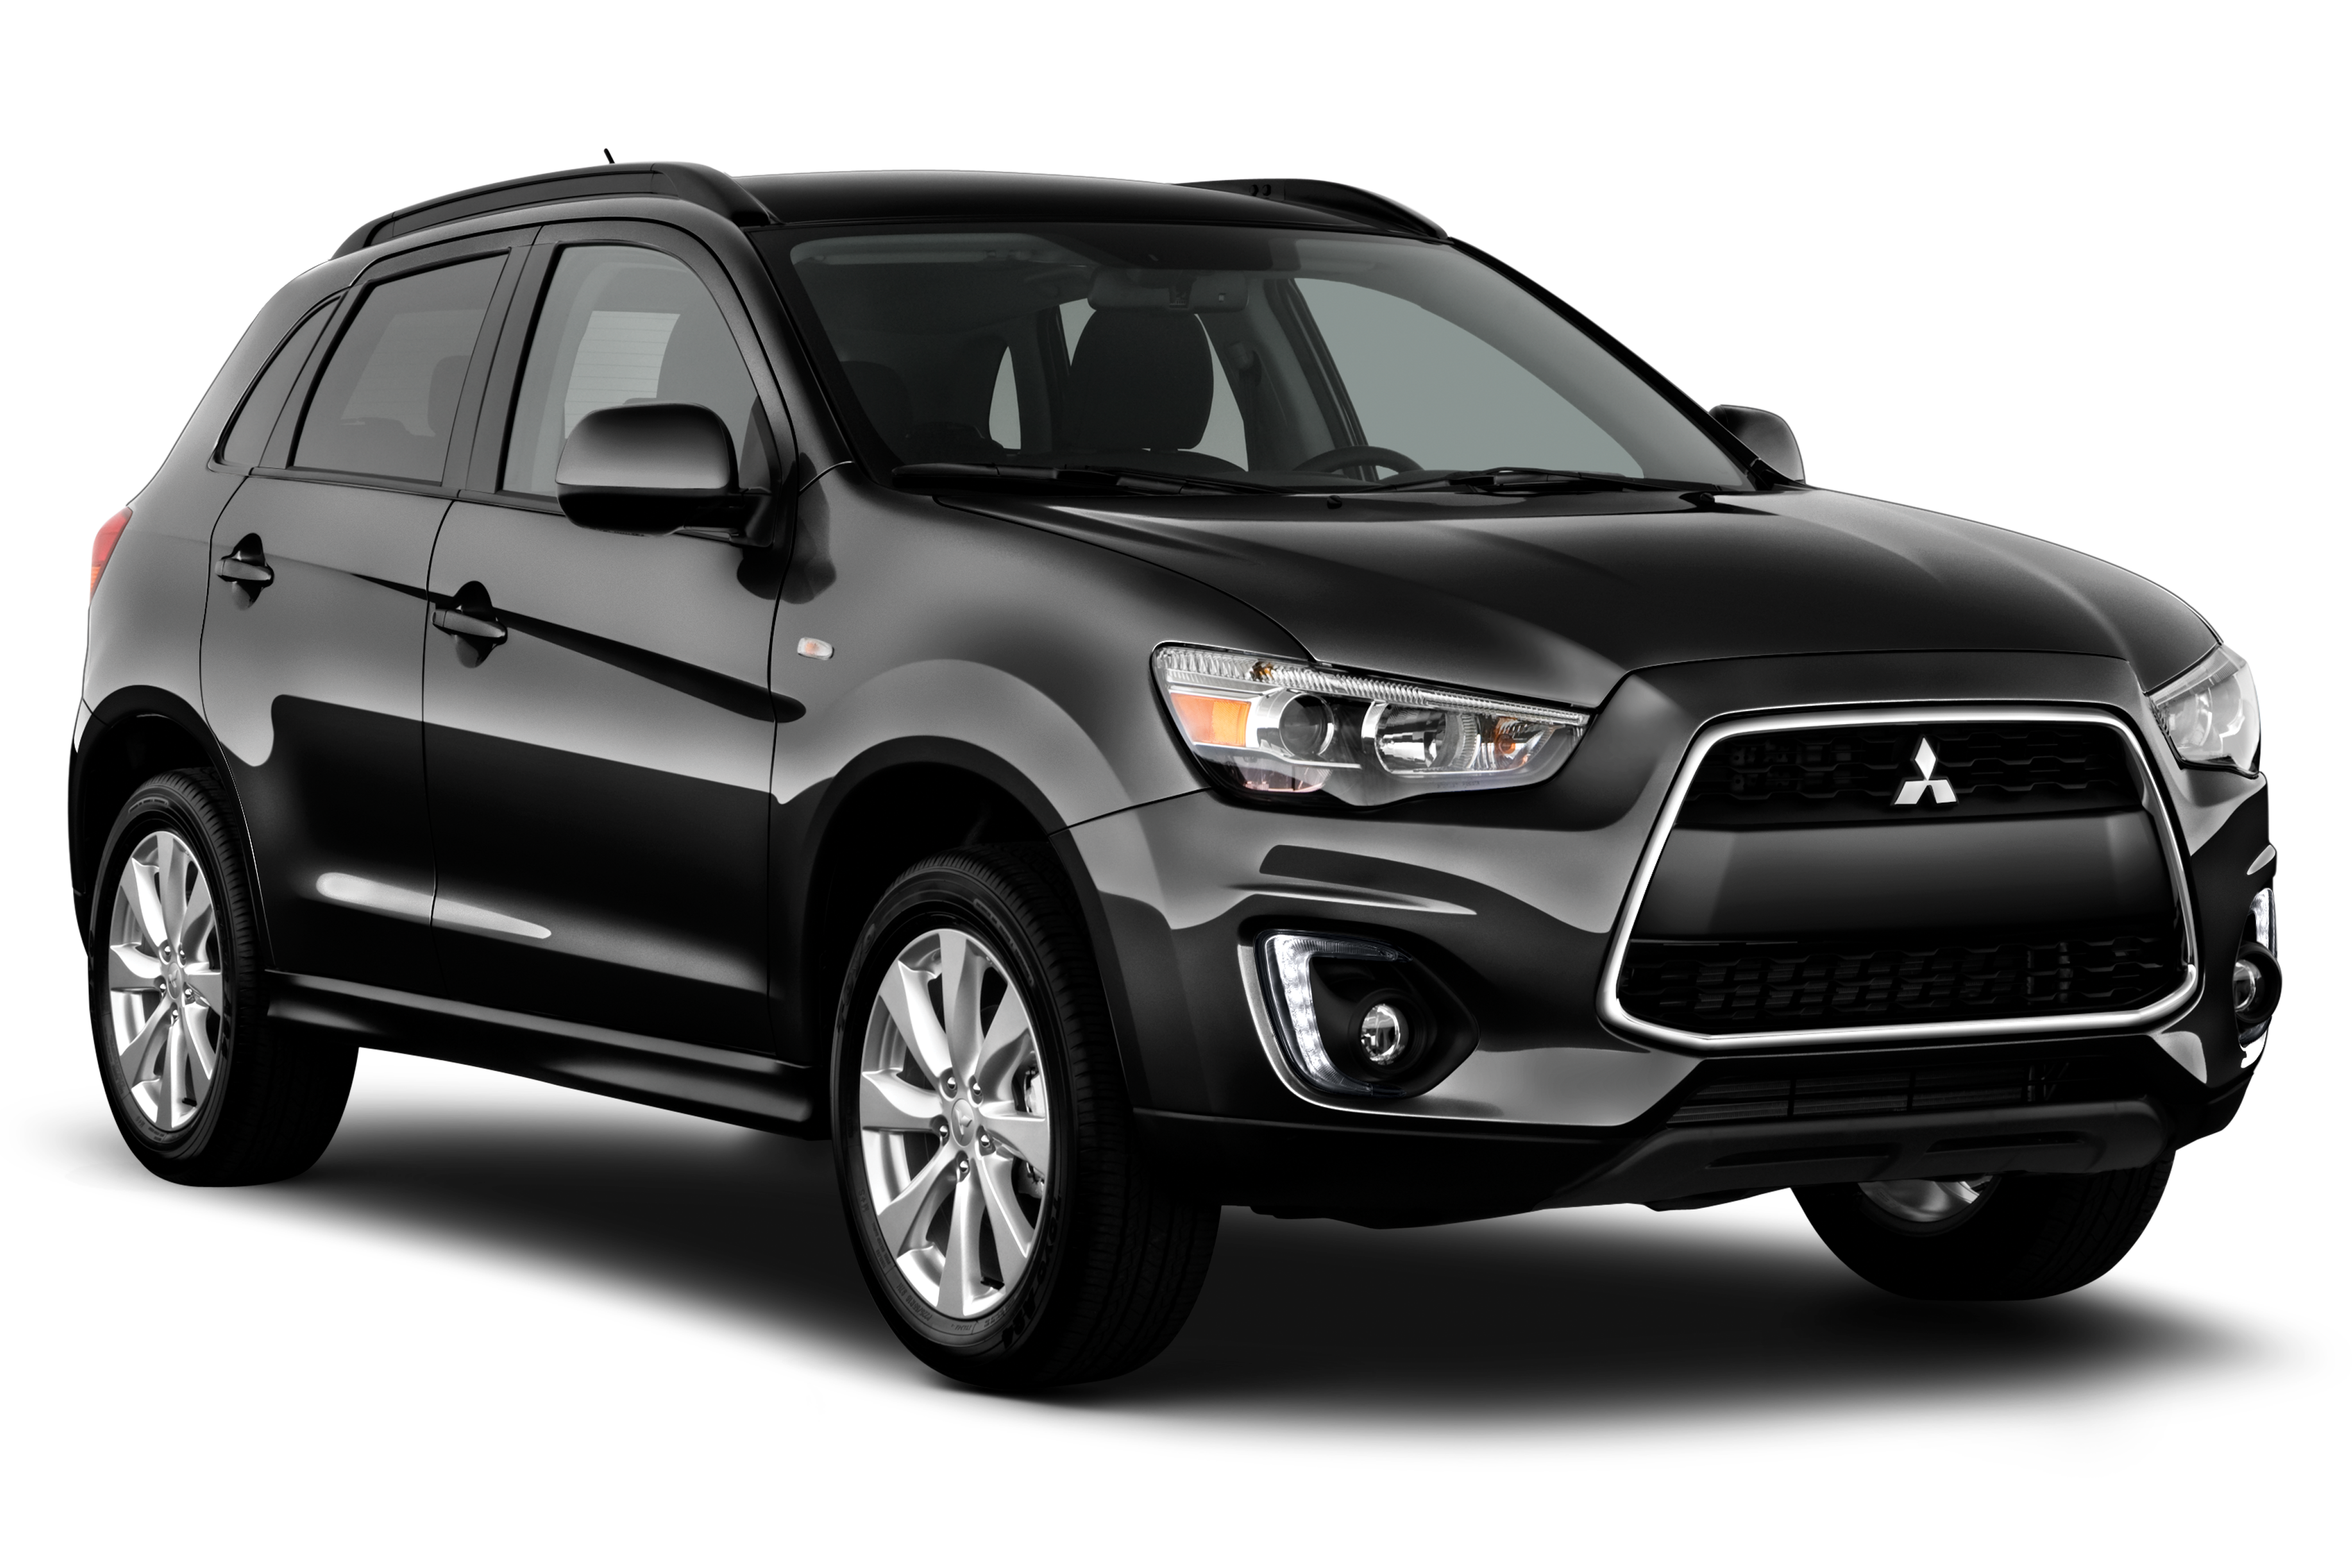 Mitsubishi Dealership Edmonton Ab Used Cars West Side | 2016 Car Release Date